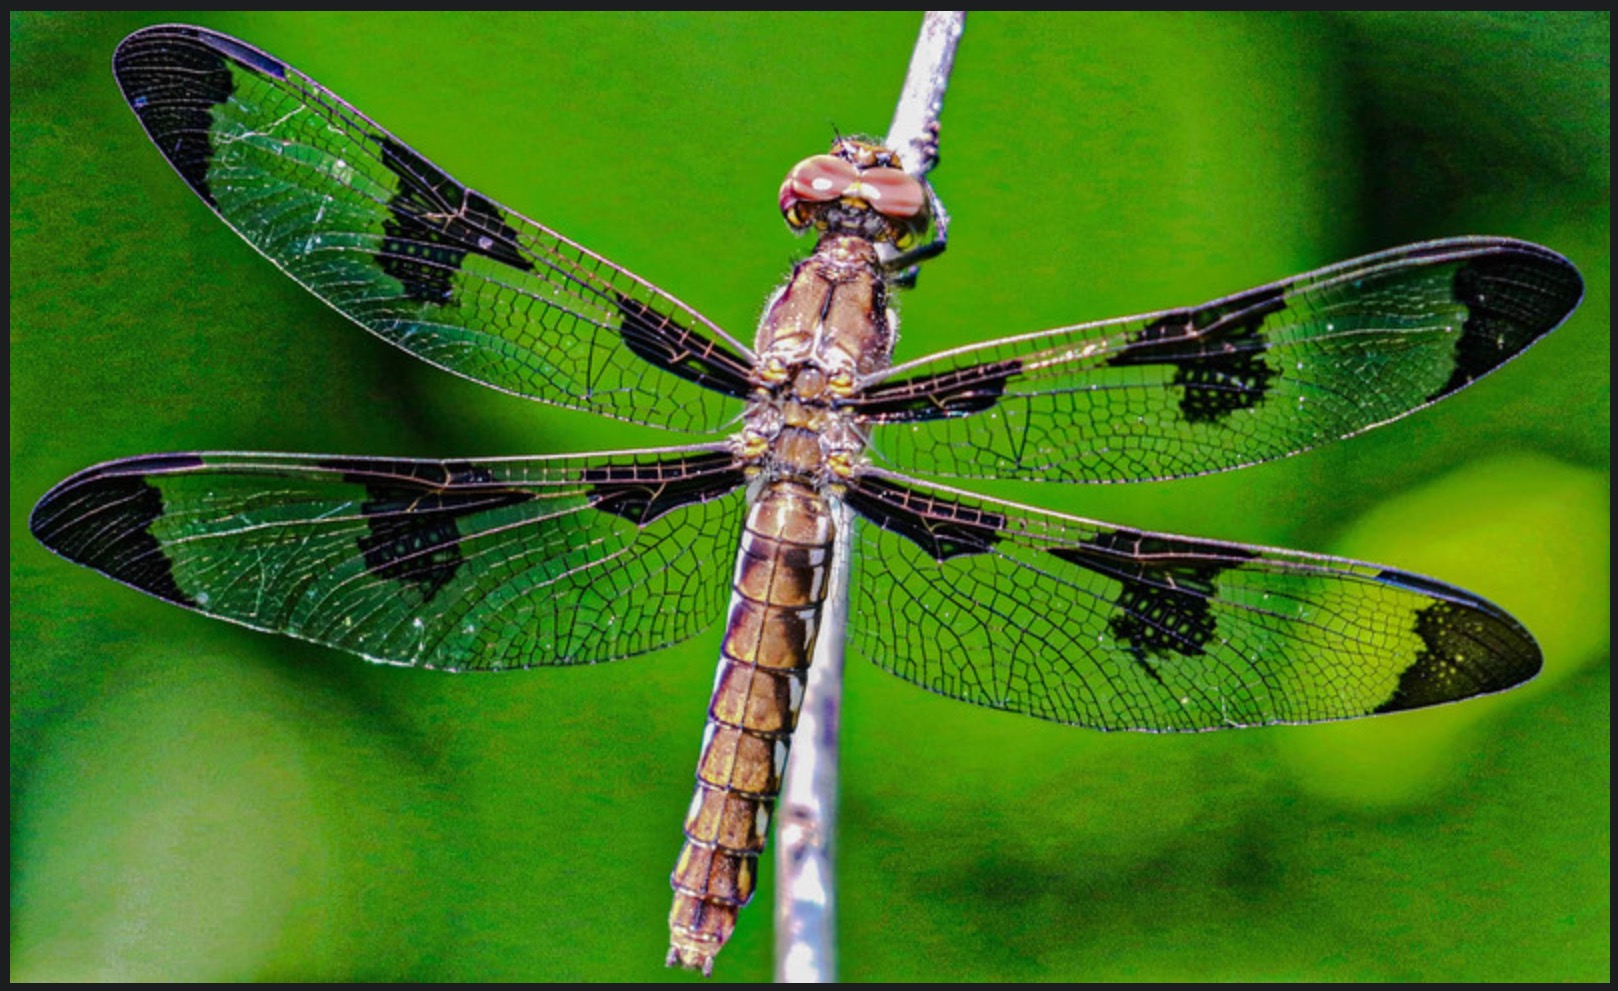 Resting Dragon fly